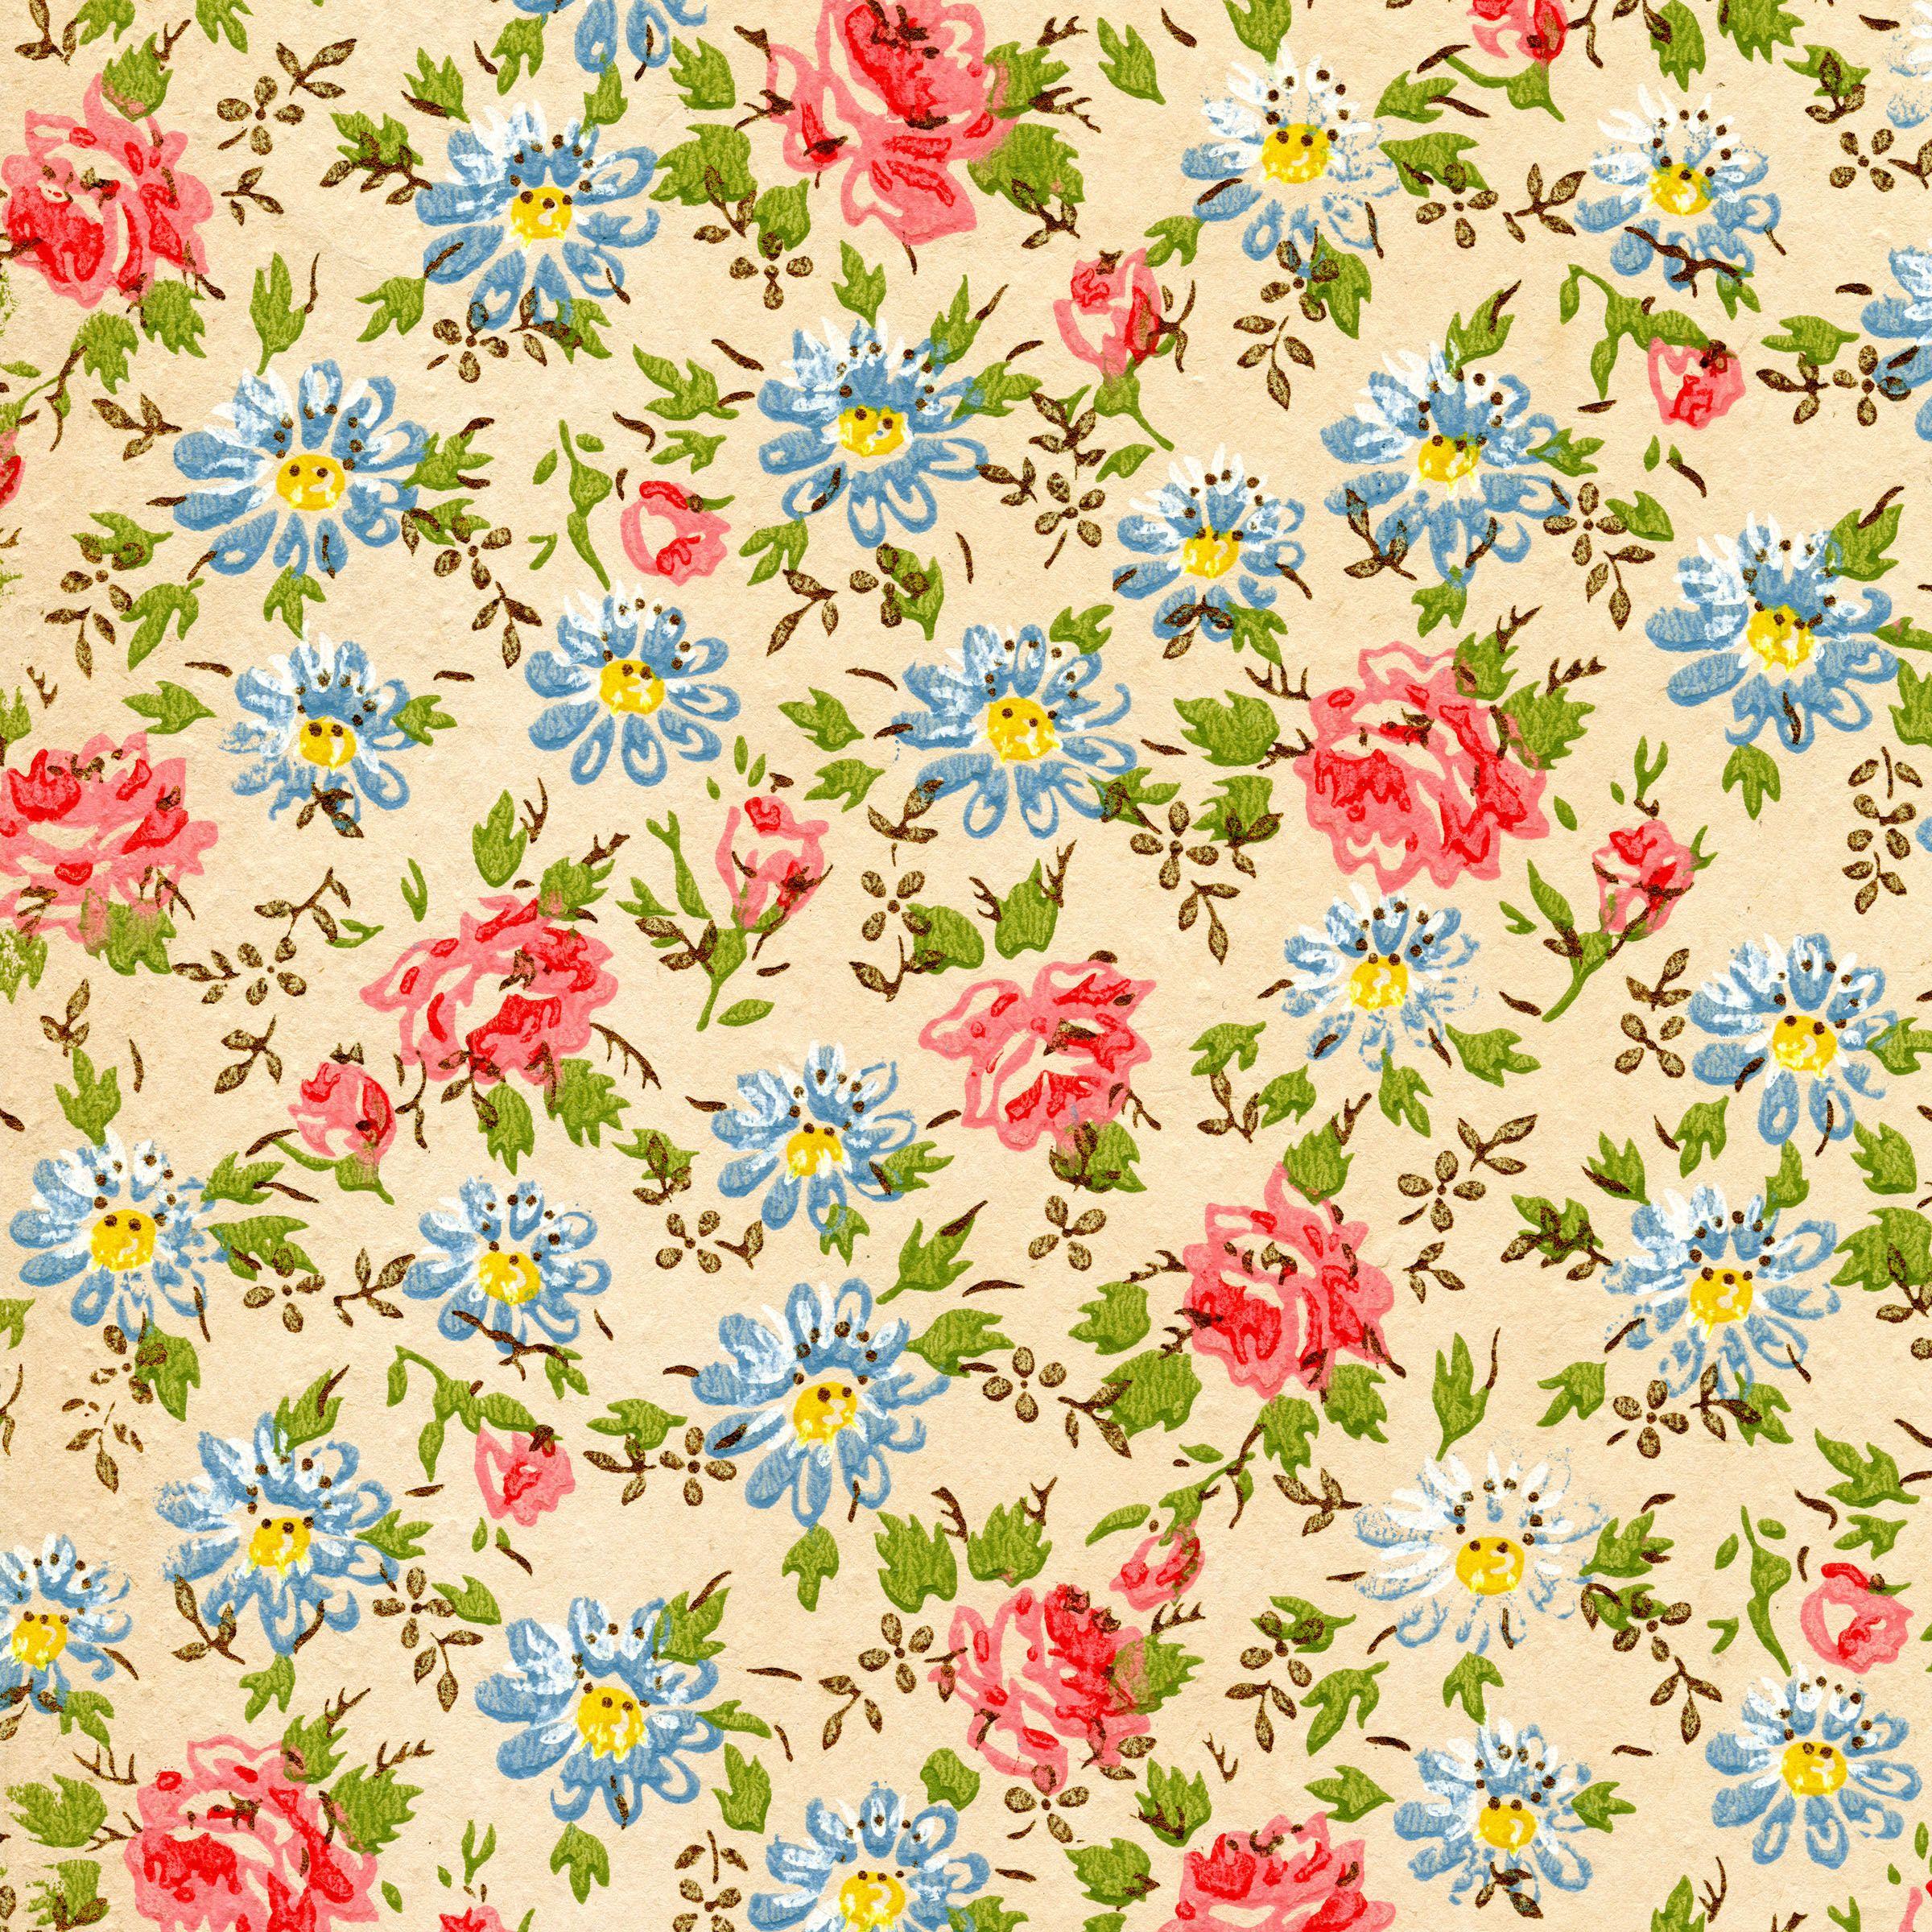 Wixcom Vintage floral wallpapers Floral pattern